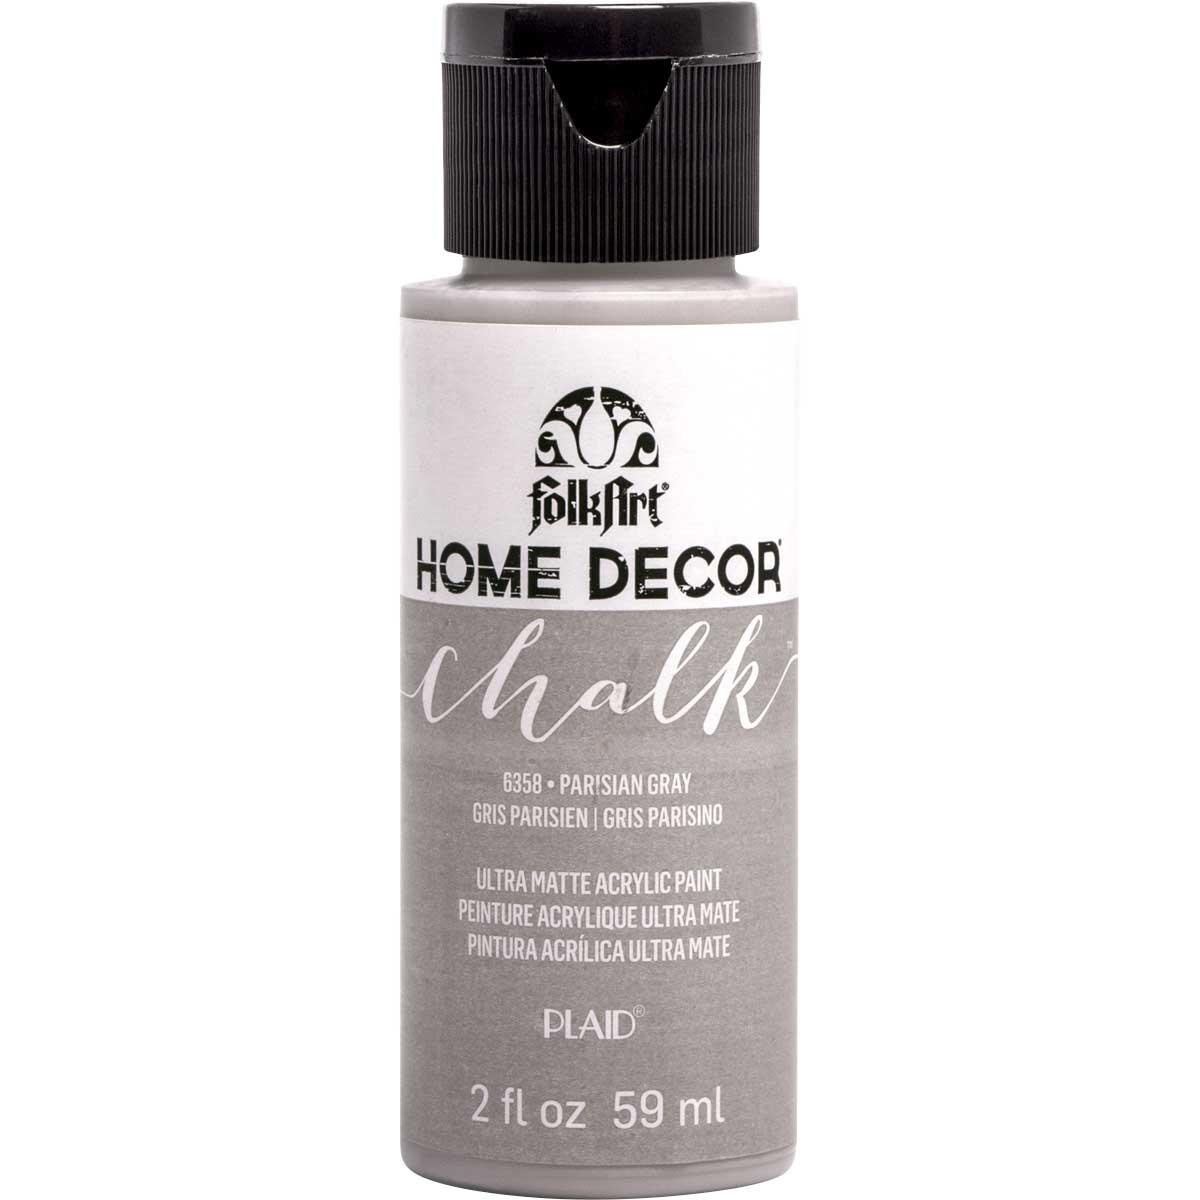 FolkArt ® Home Decor™ Chalk - Parisian Gray, 2 oz. - 6358